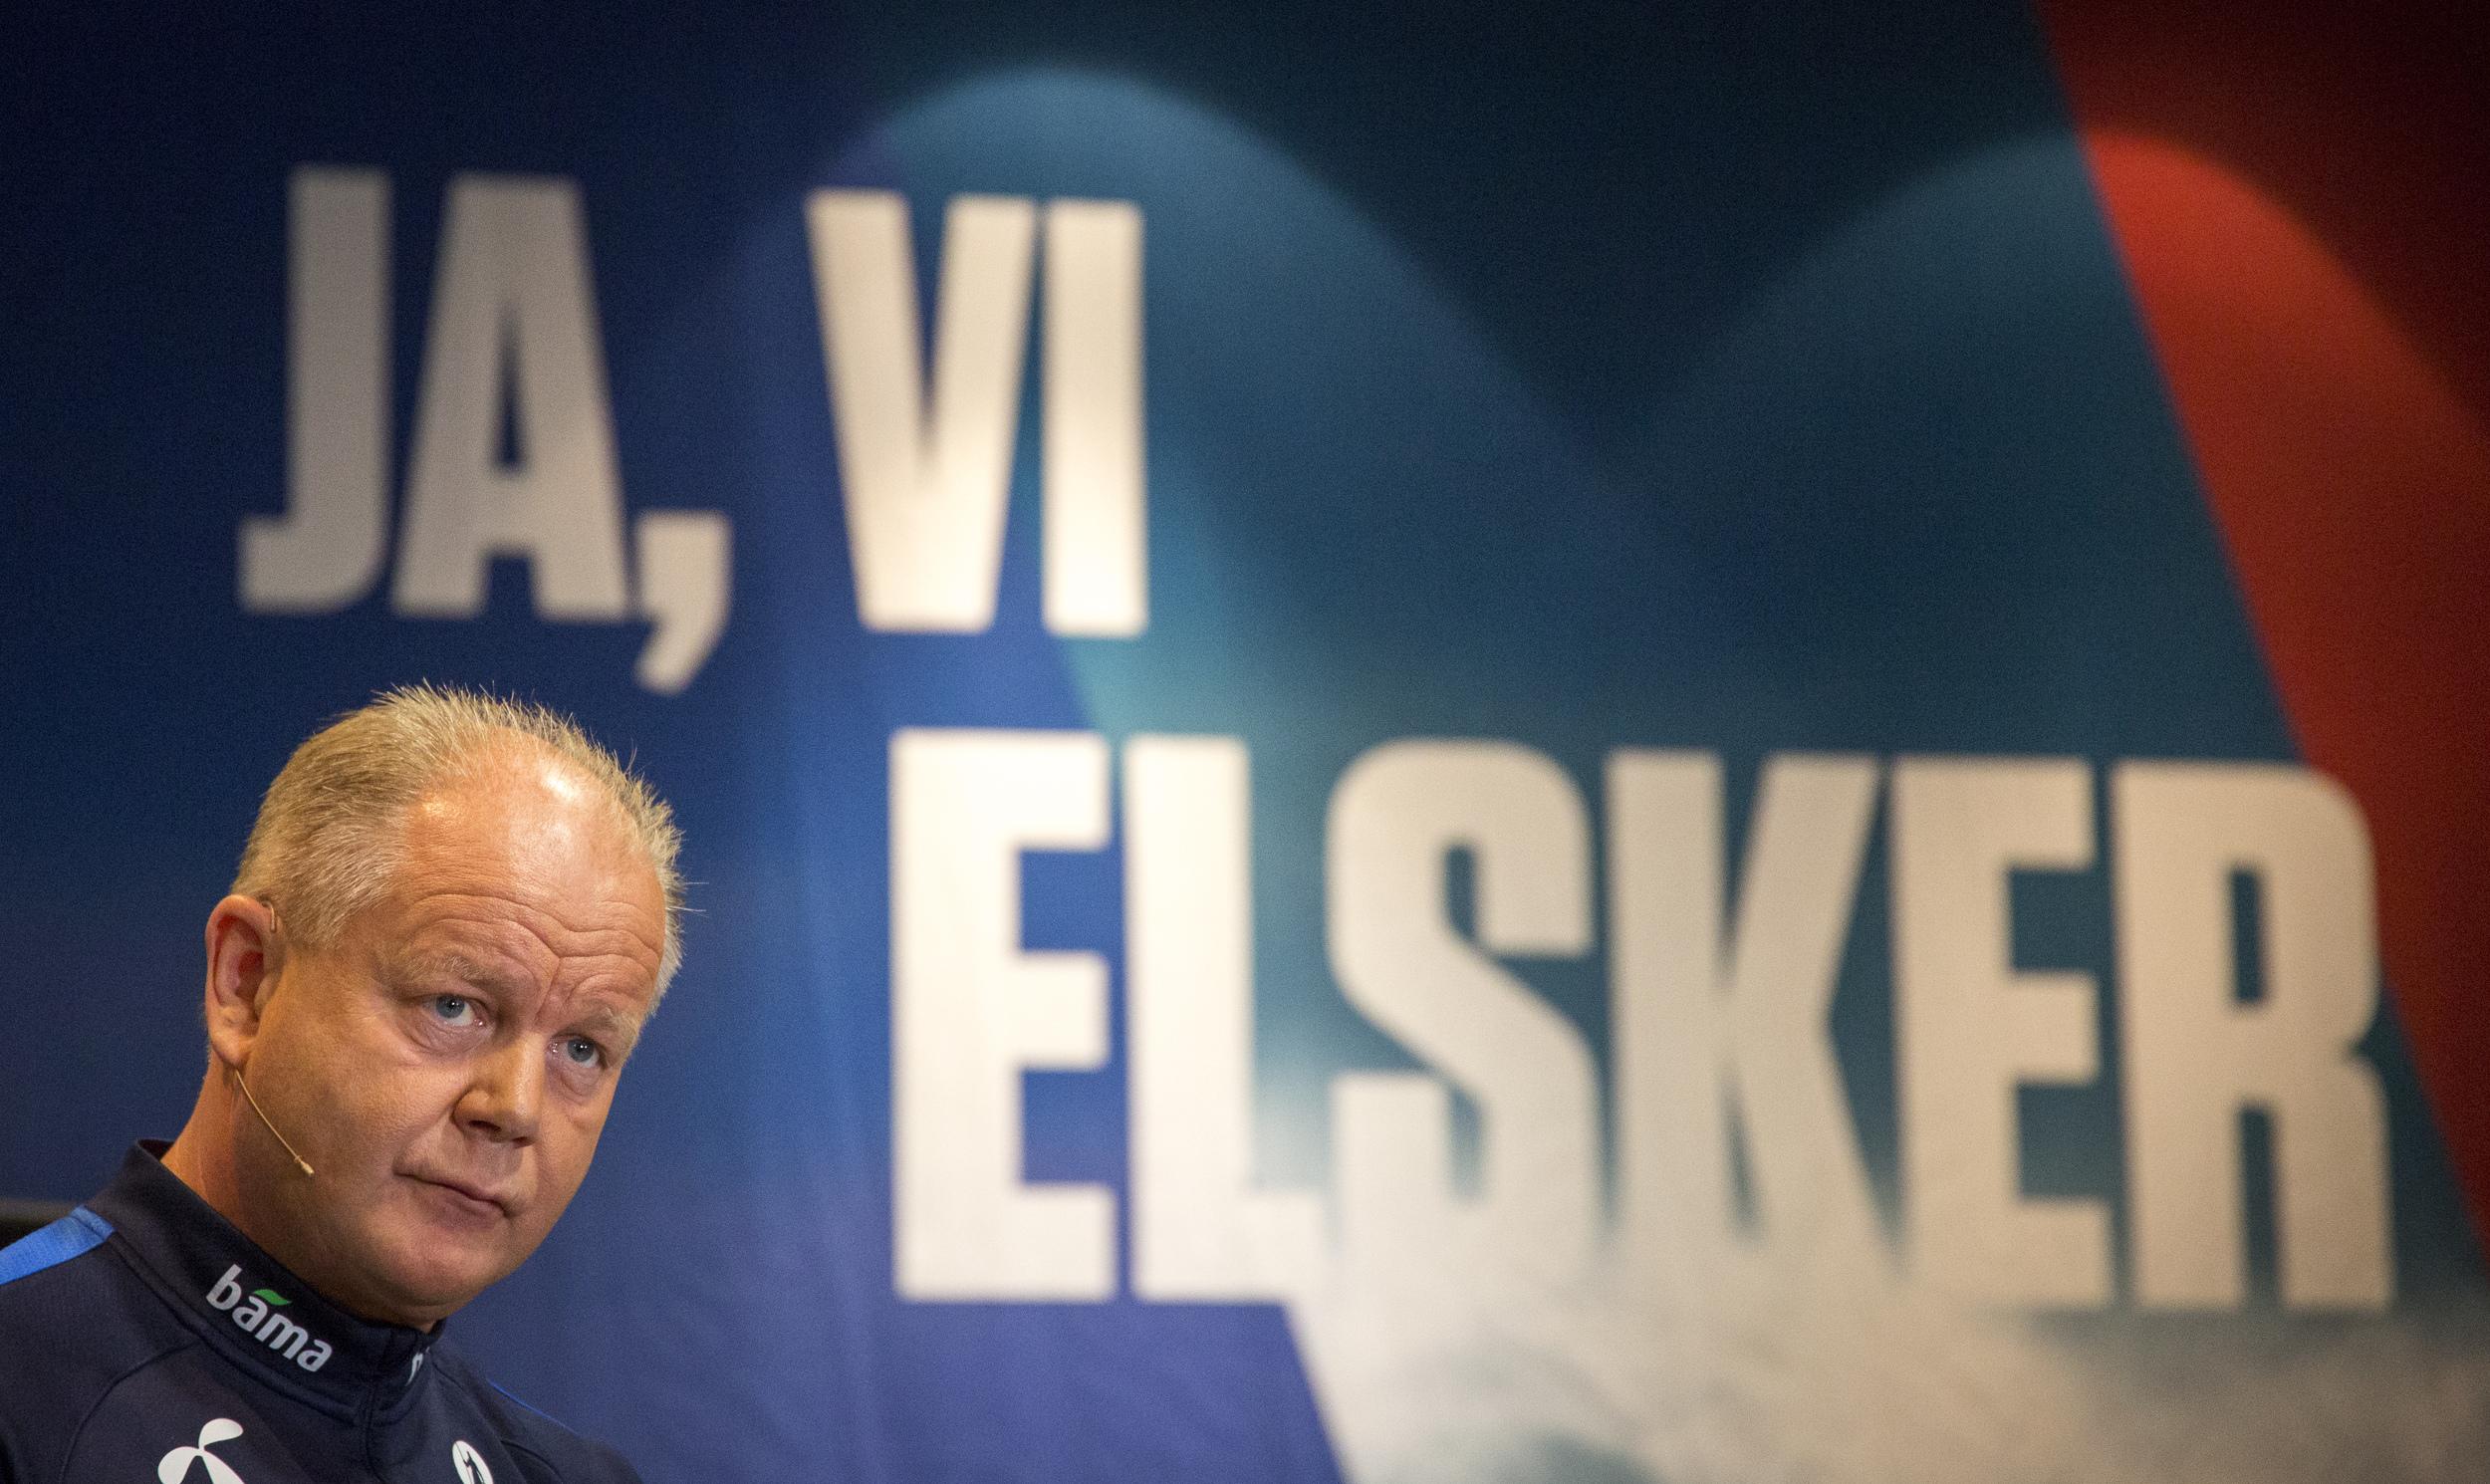 Coach for the Norwegian national football team Per-Mathias Høgmoe